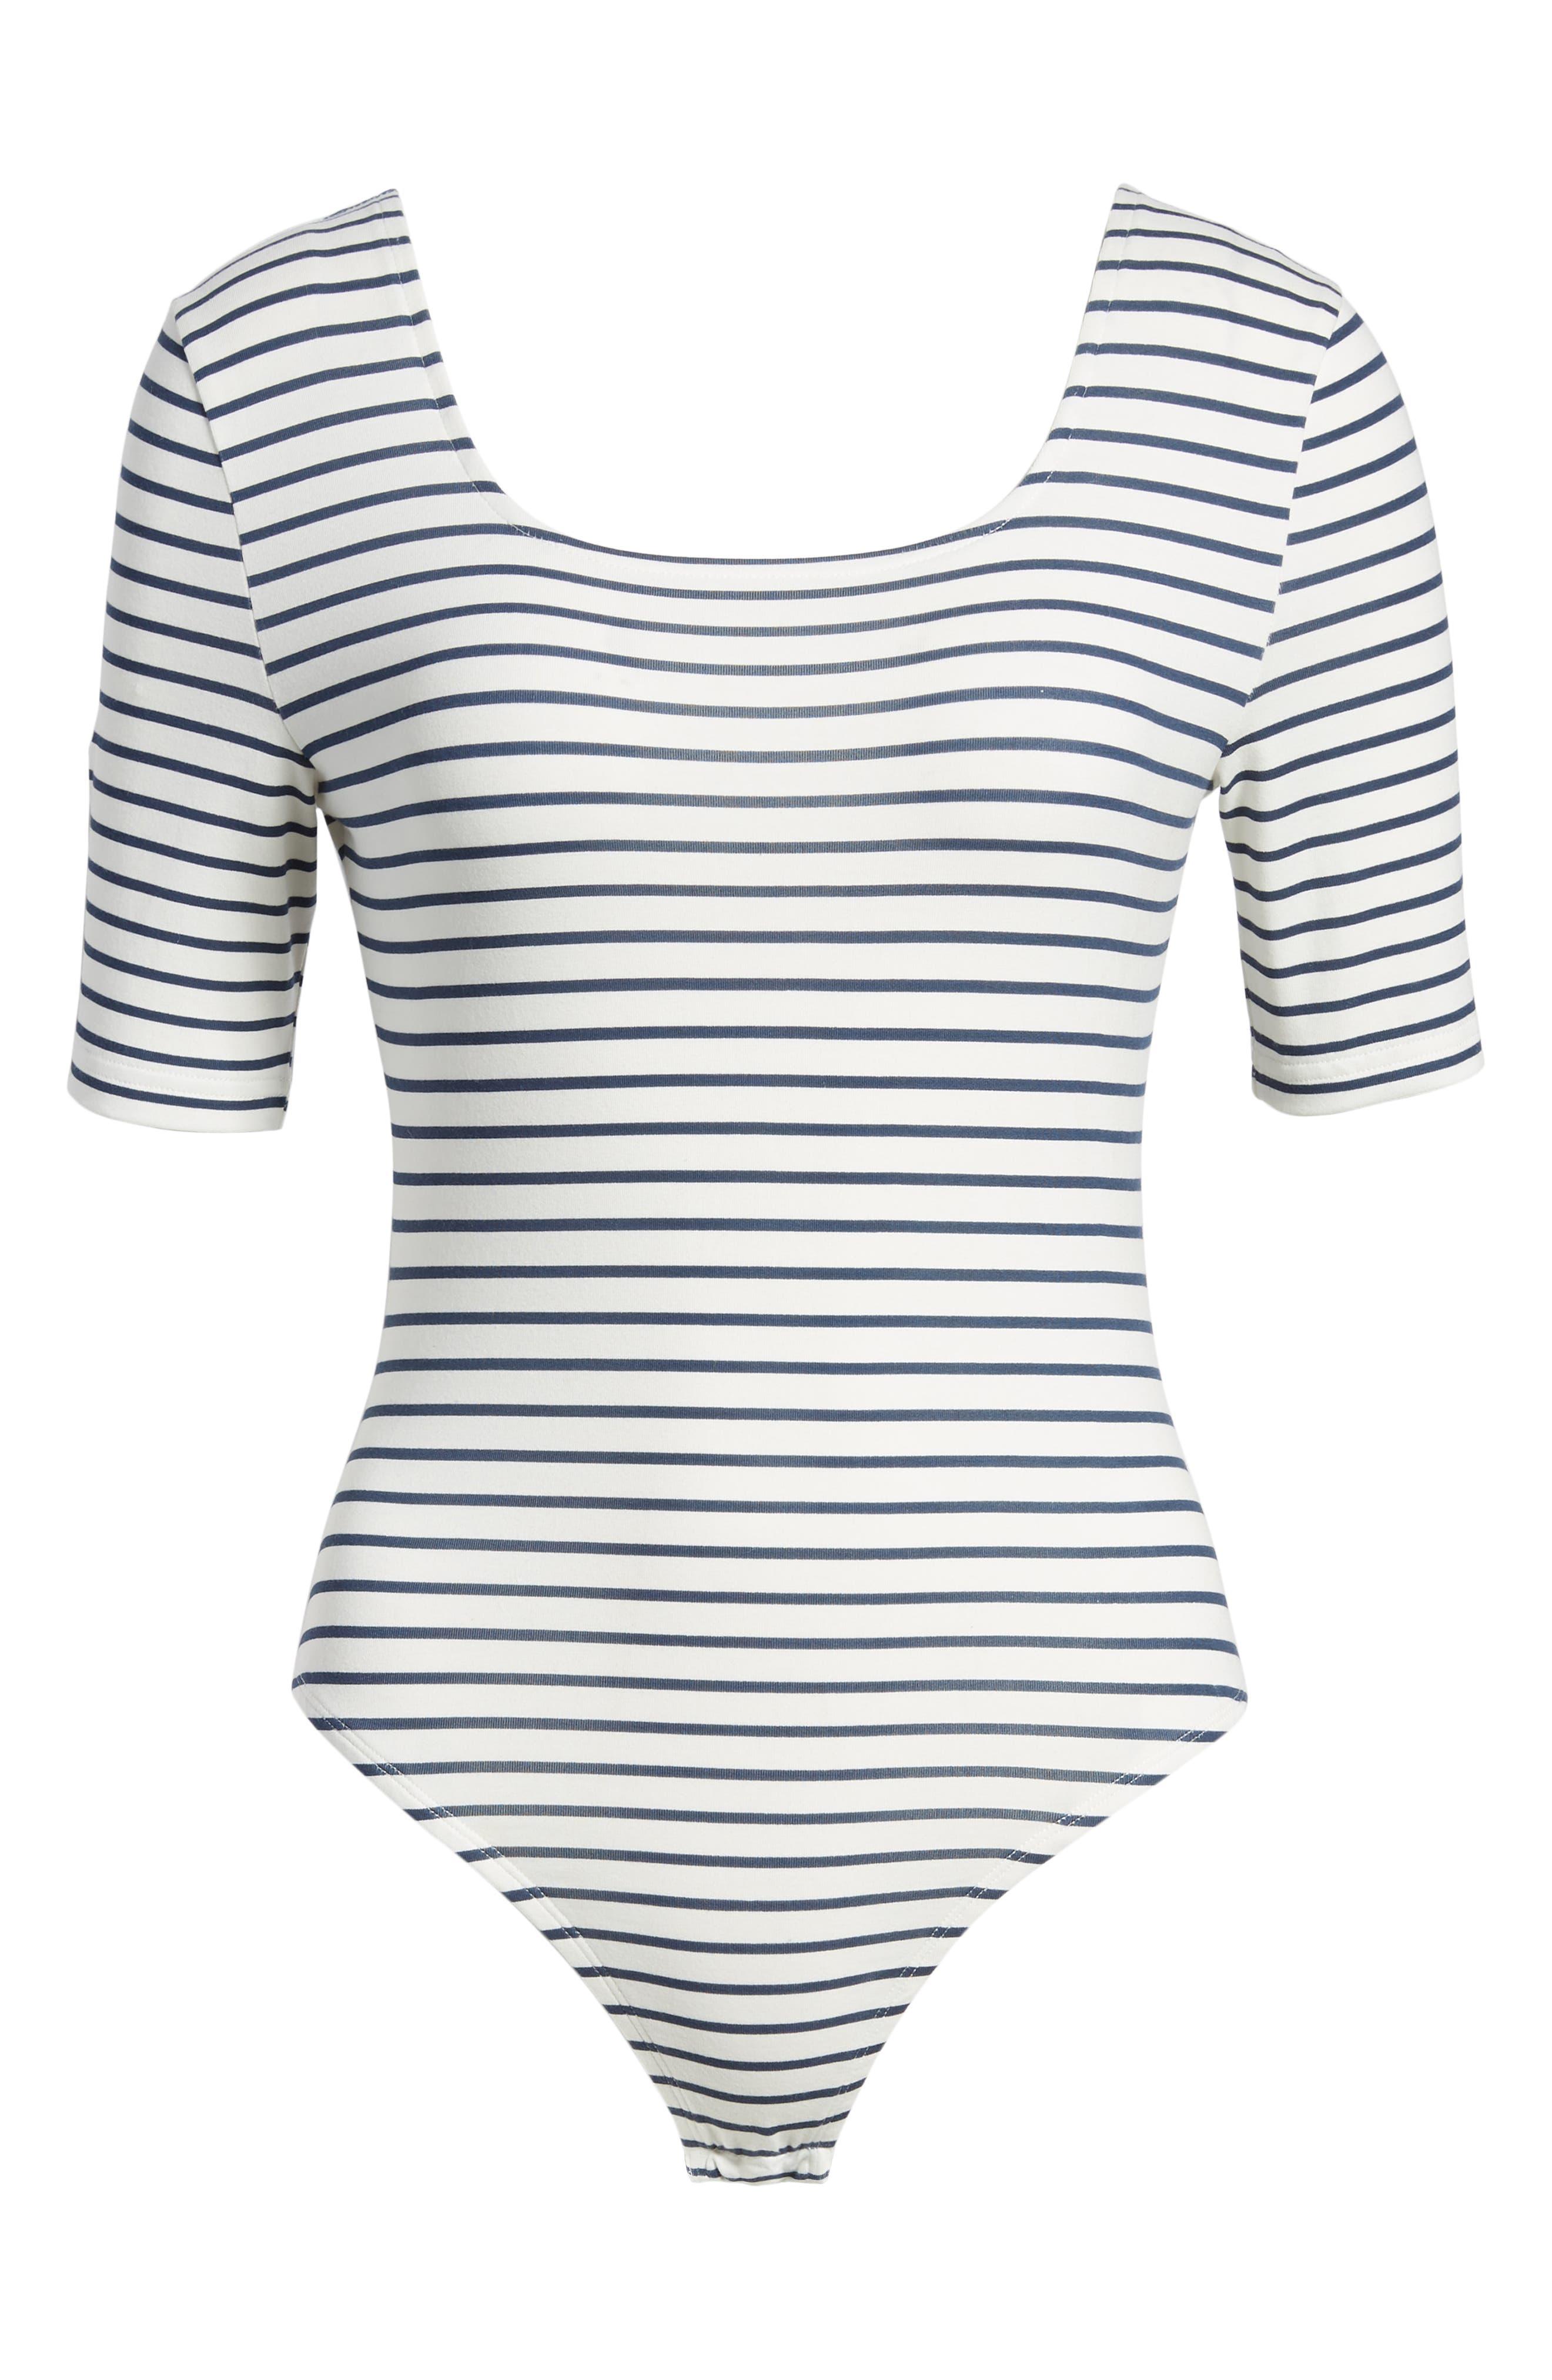 Stripe Square Neck Bodysuit,                             Alternate thumbnail 6, color,                             WHITE / NAVY STRIPE